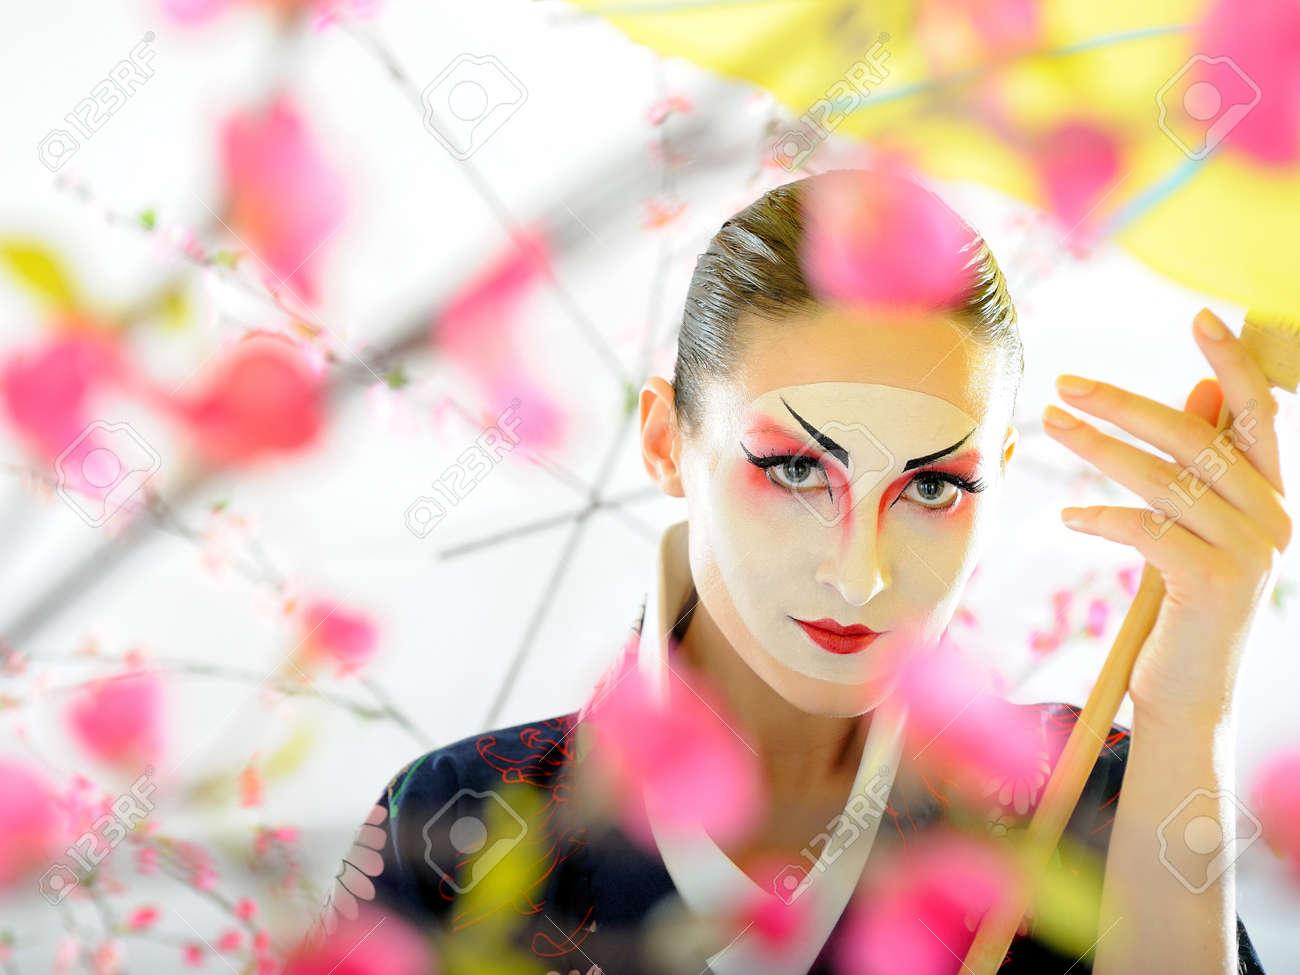 japan geisha woman with creative make-up in sakura garden.close-up artistic portrait Stock Photo - 8949814